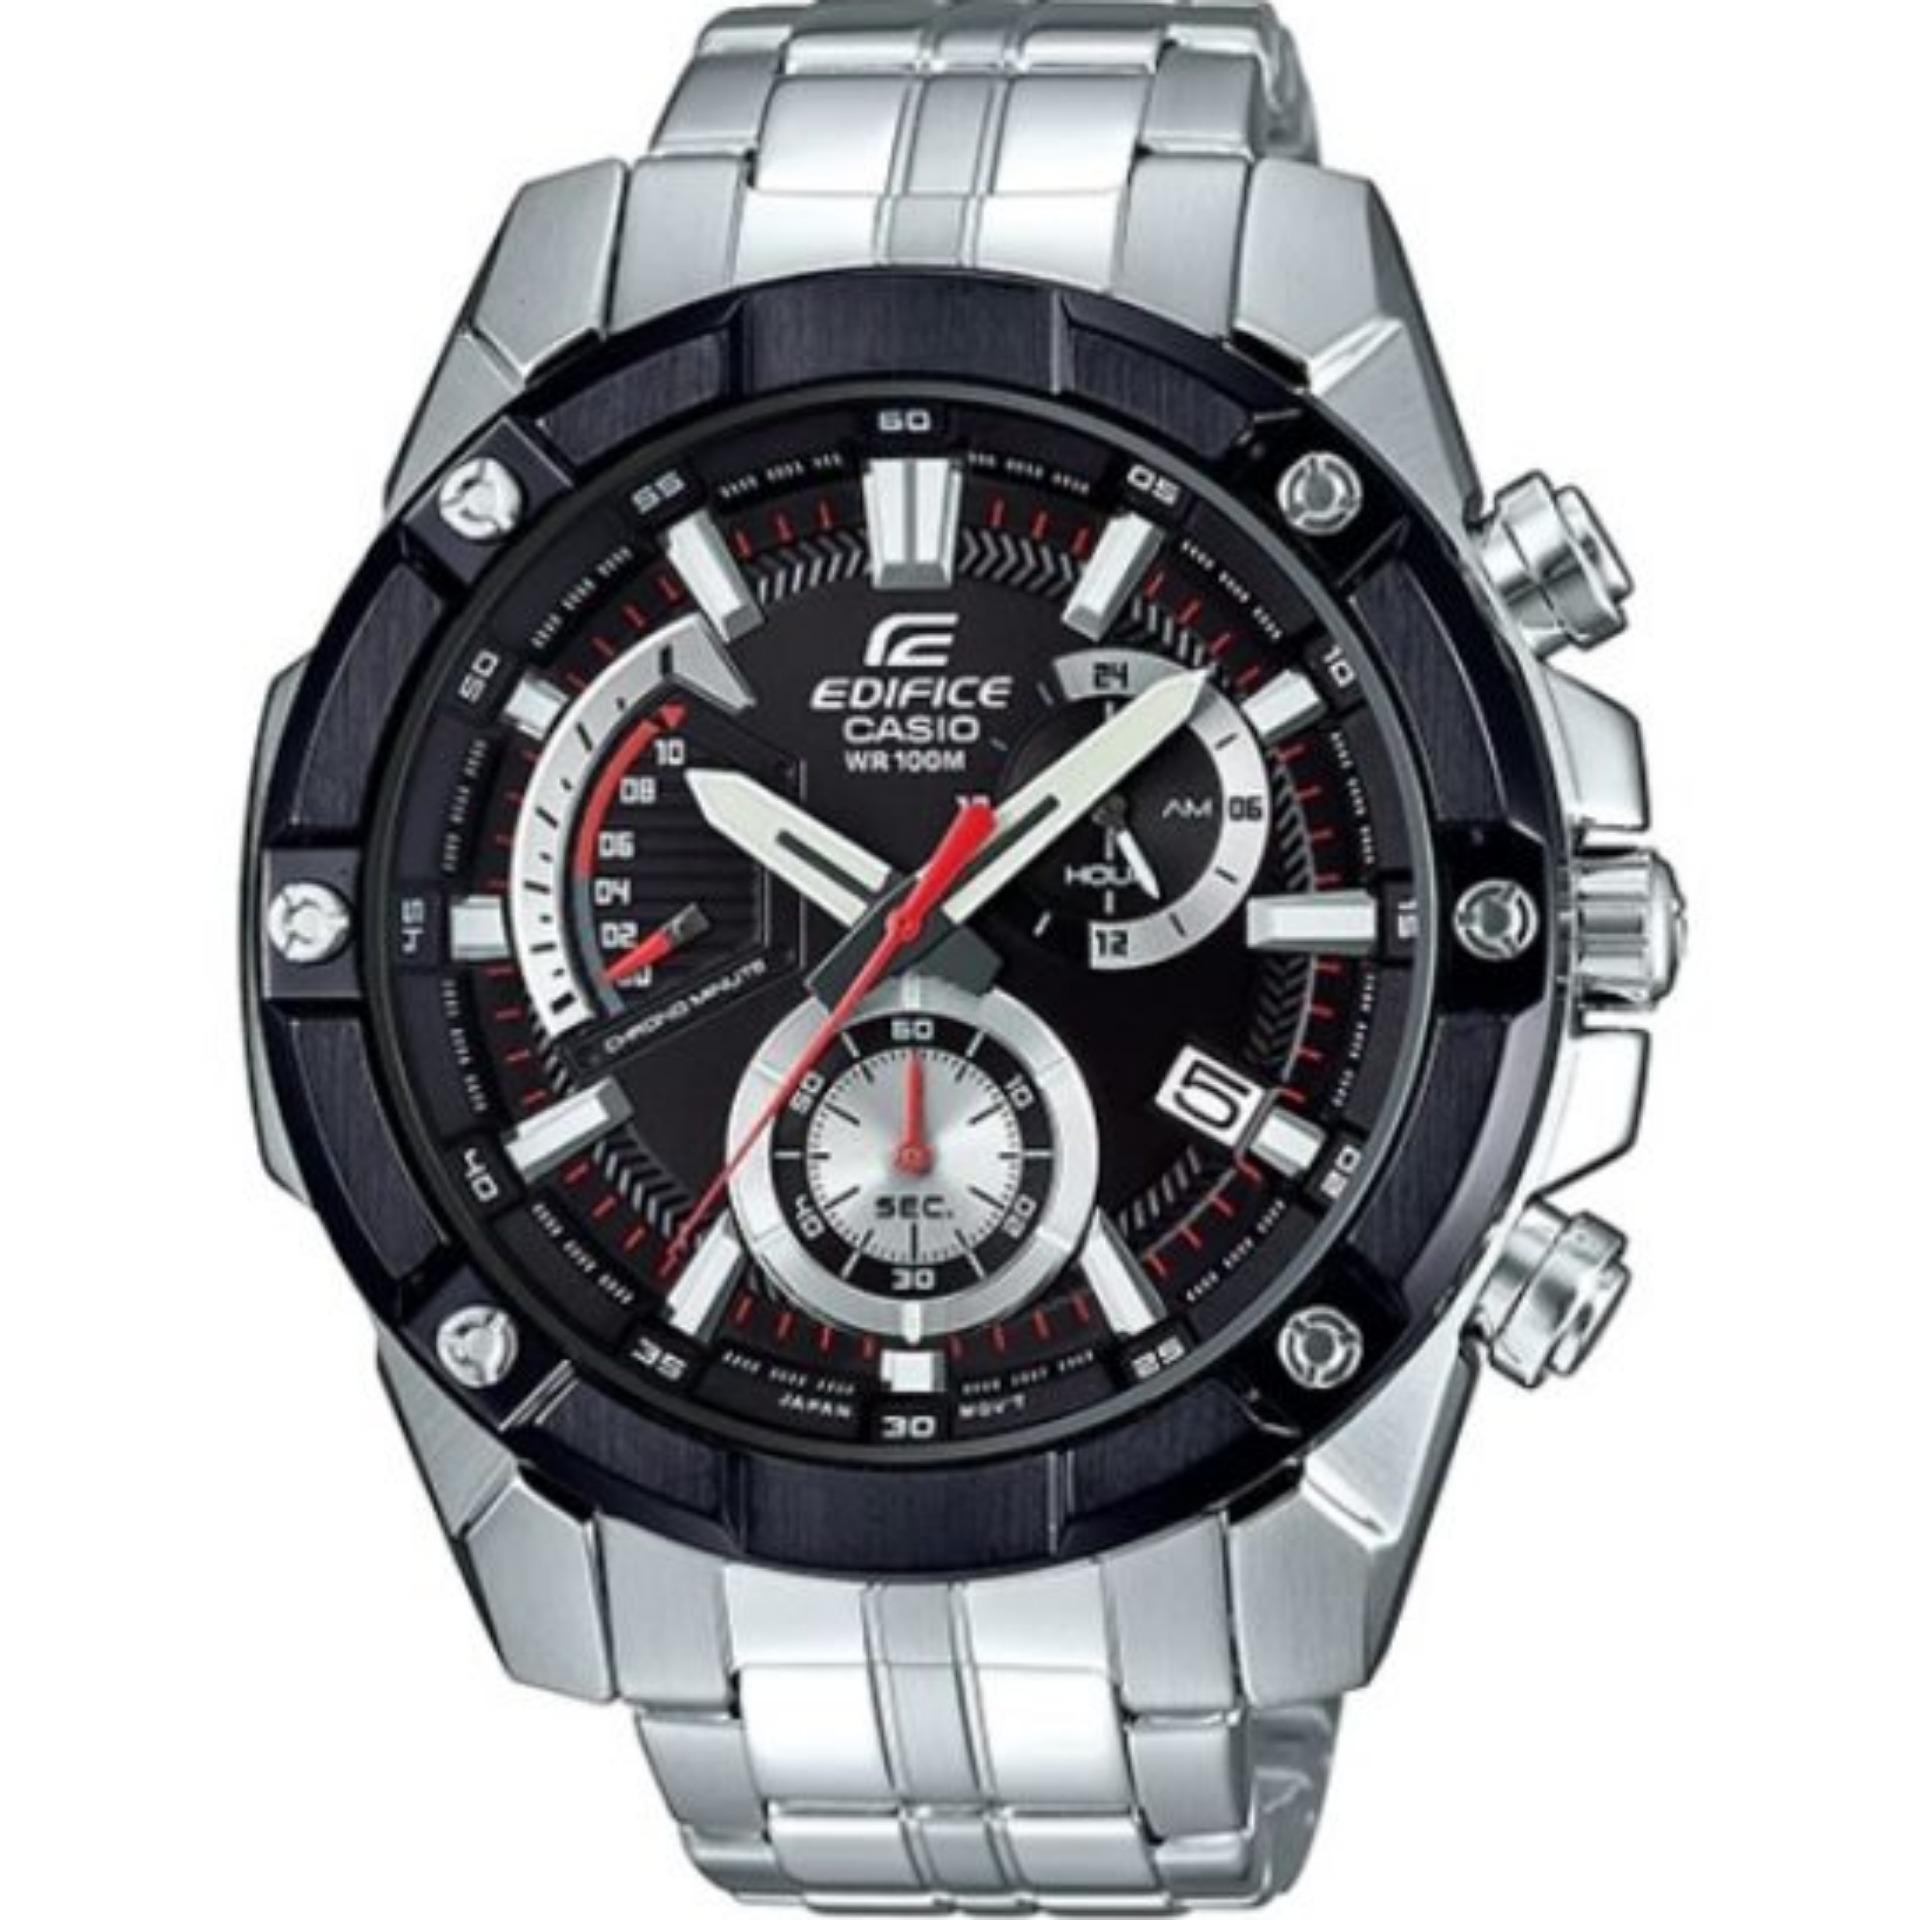 Casio Edifice EFR-559DB-1A Standard Chronograph Men's Watch